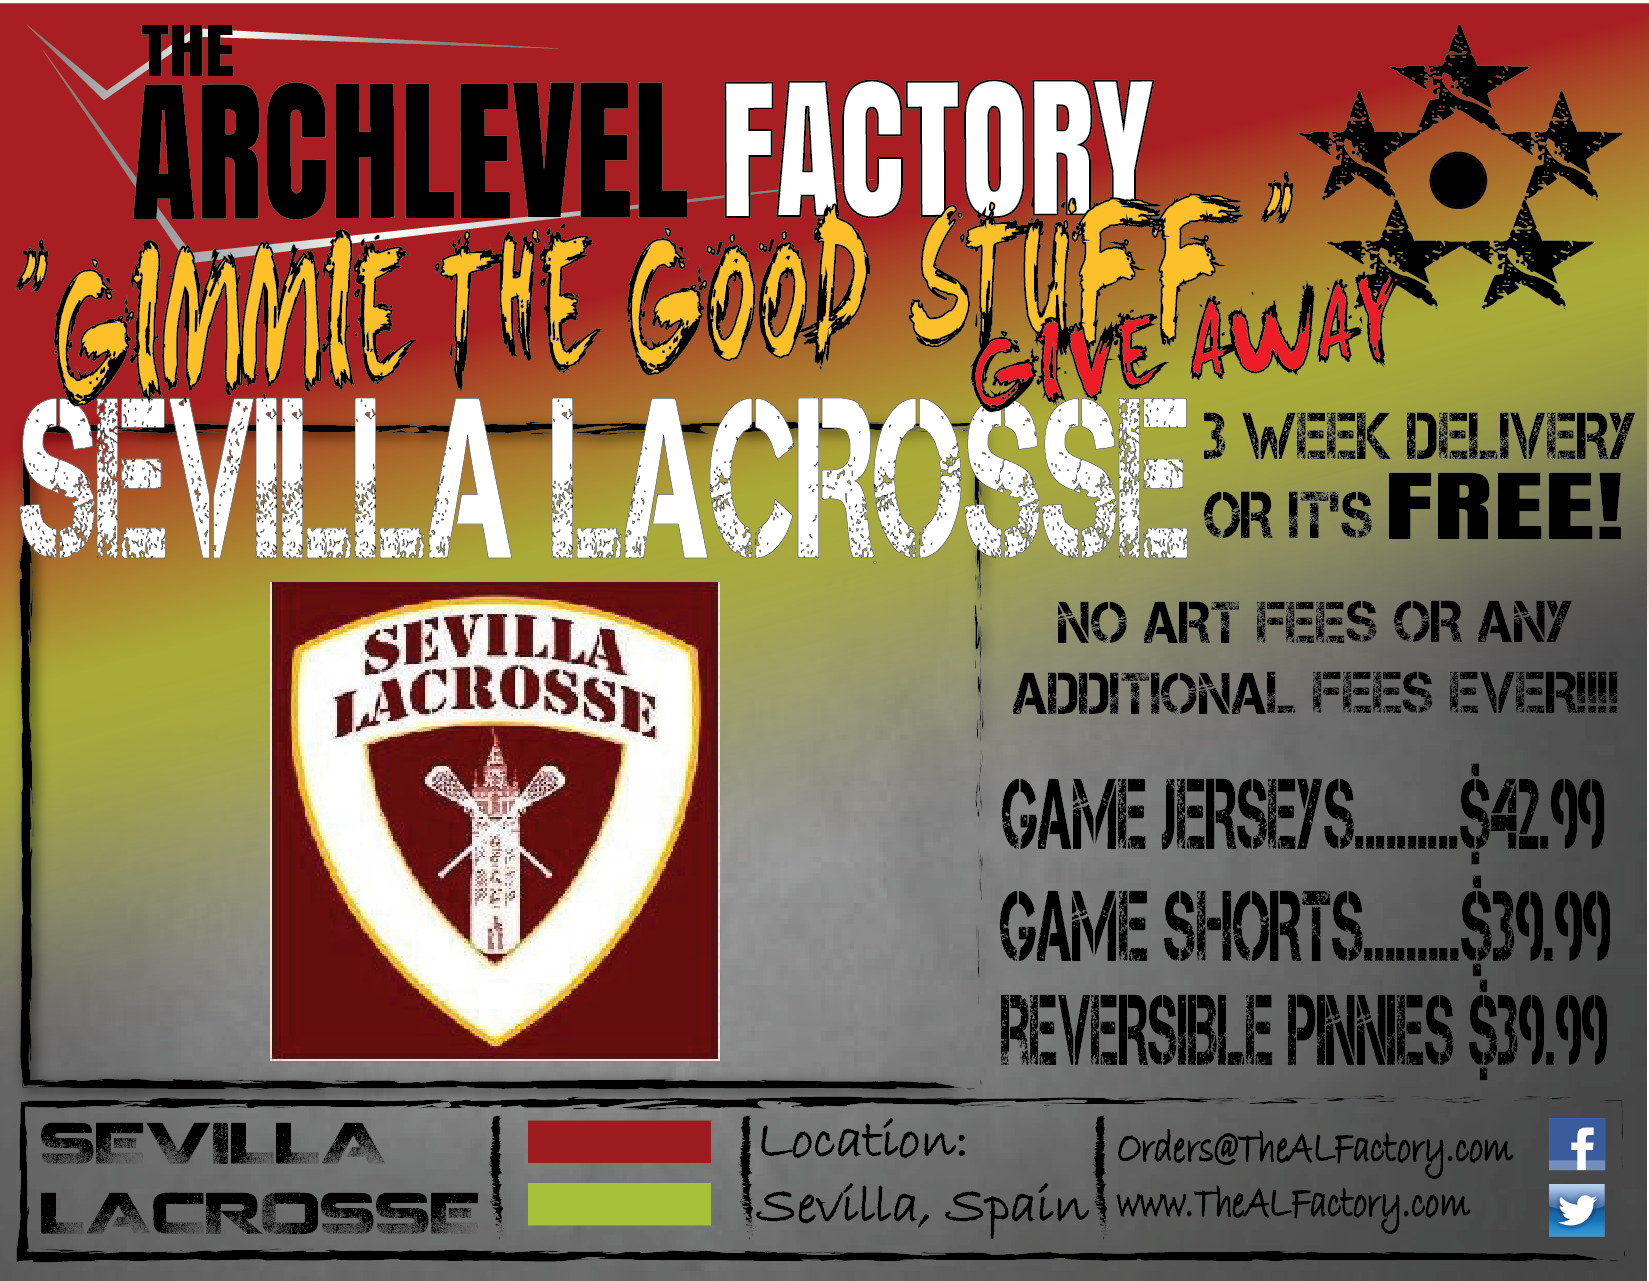 Sevilla Lacrosse